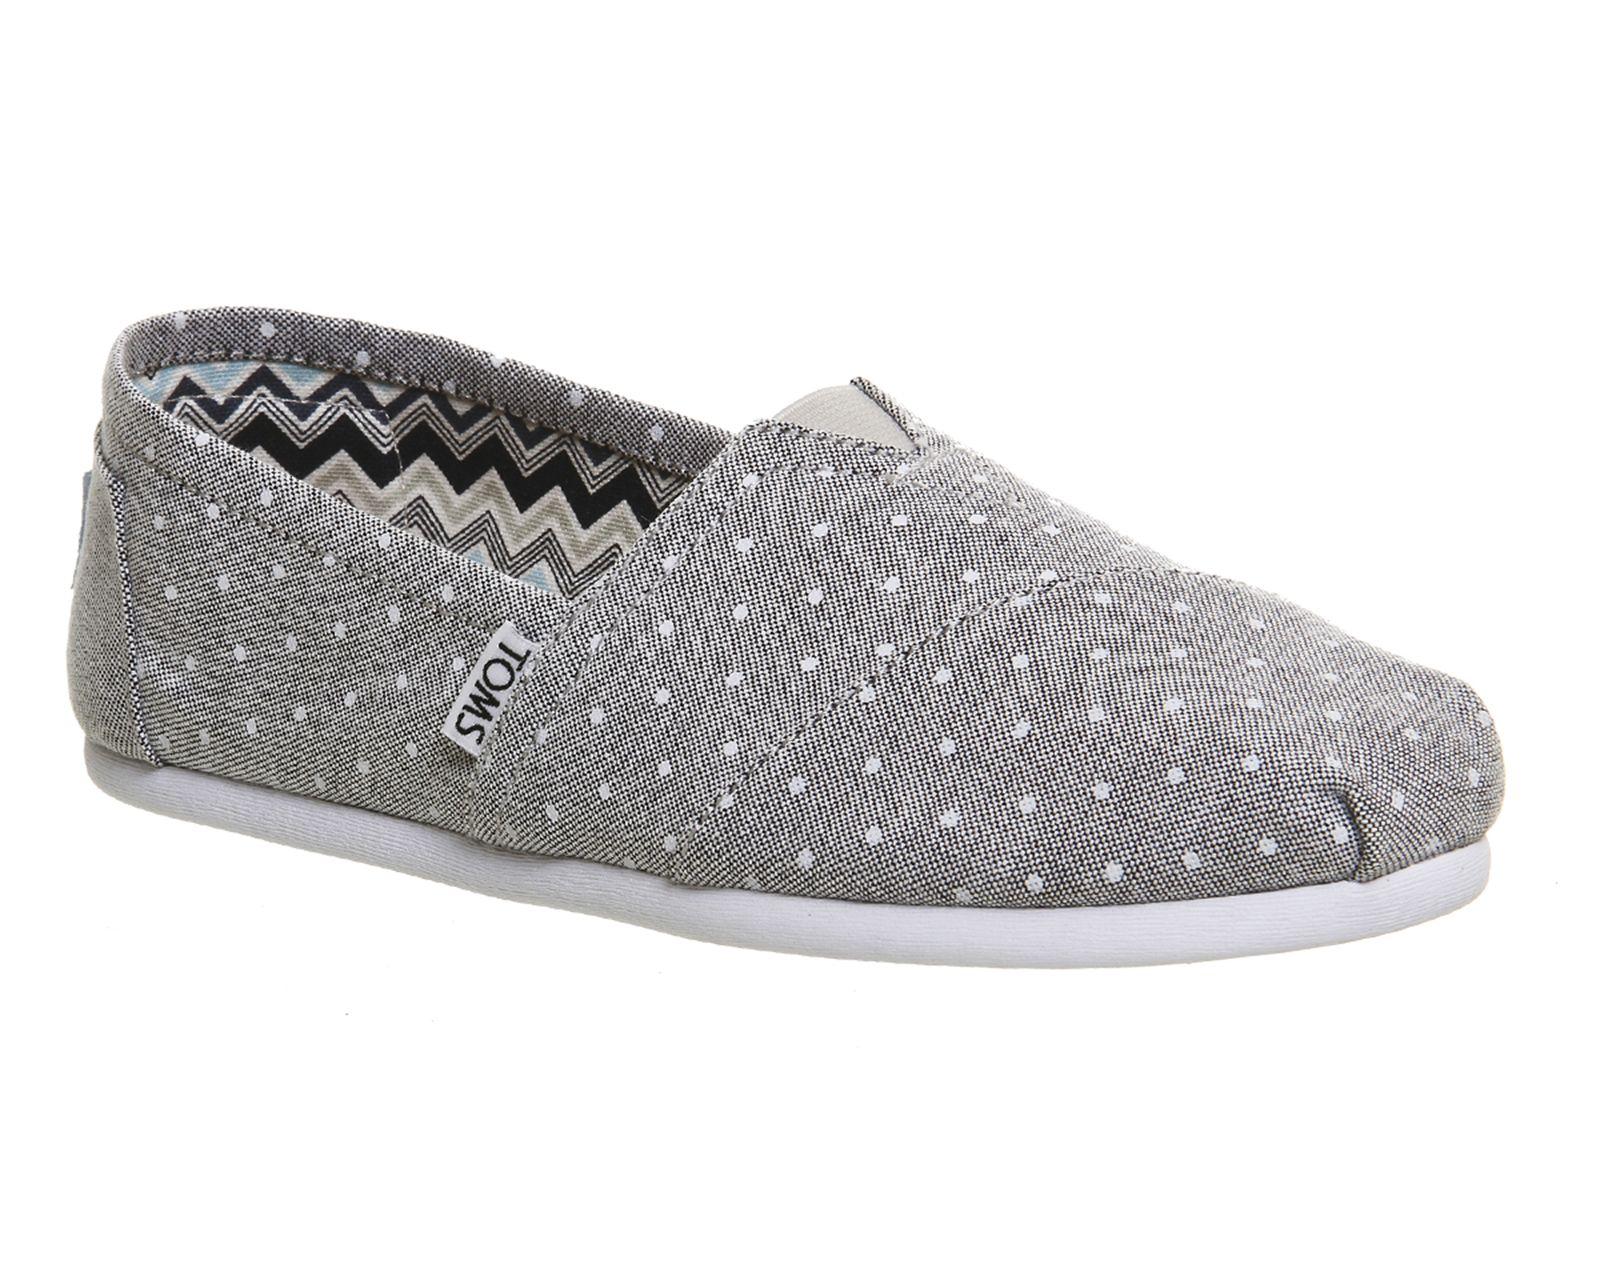 Buy Black Crochet Toms Seasonal Classic Slip On Womens Shoes